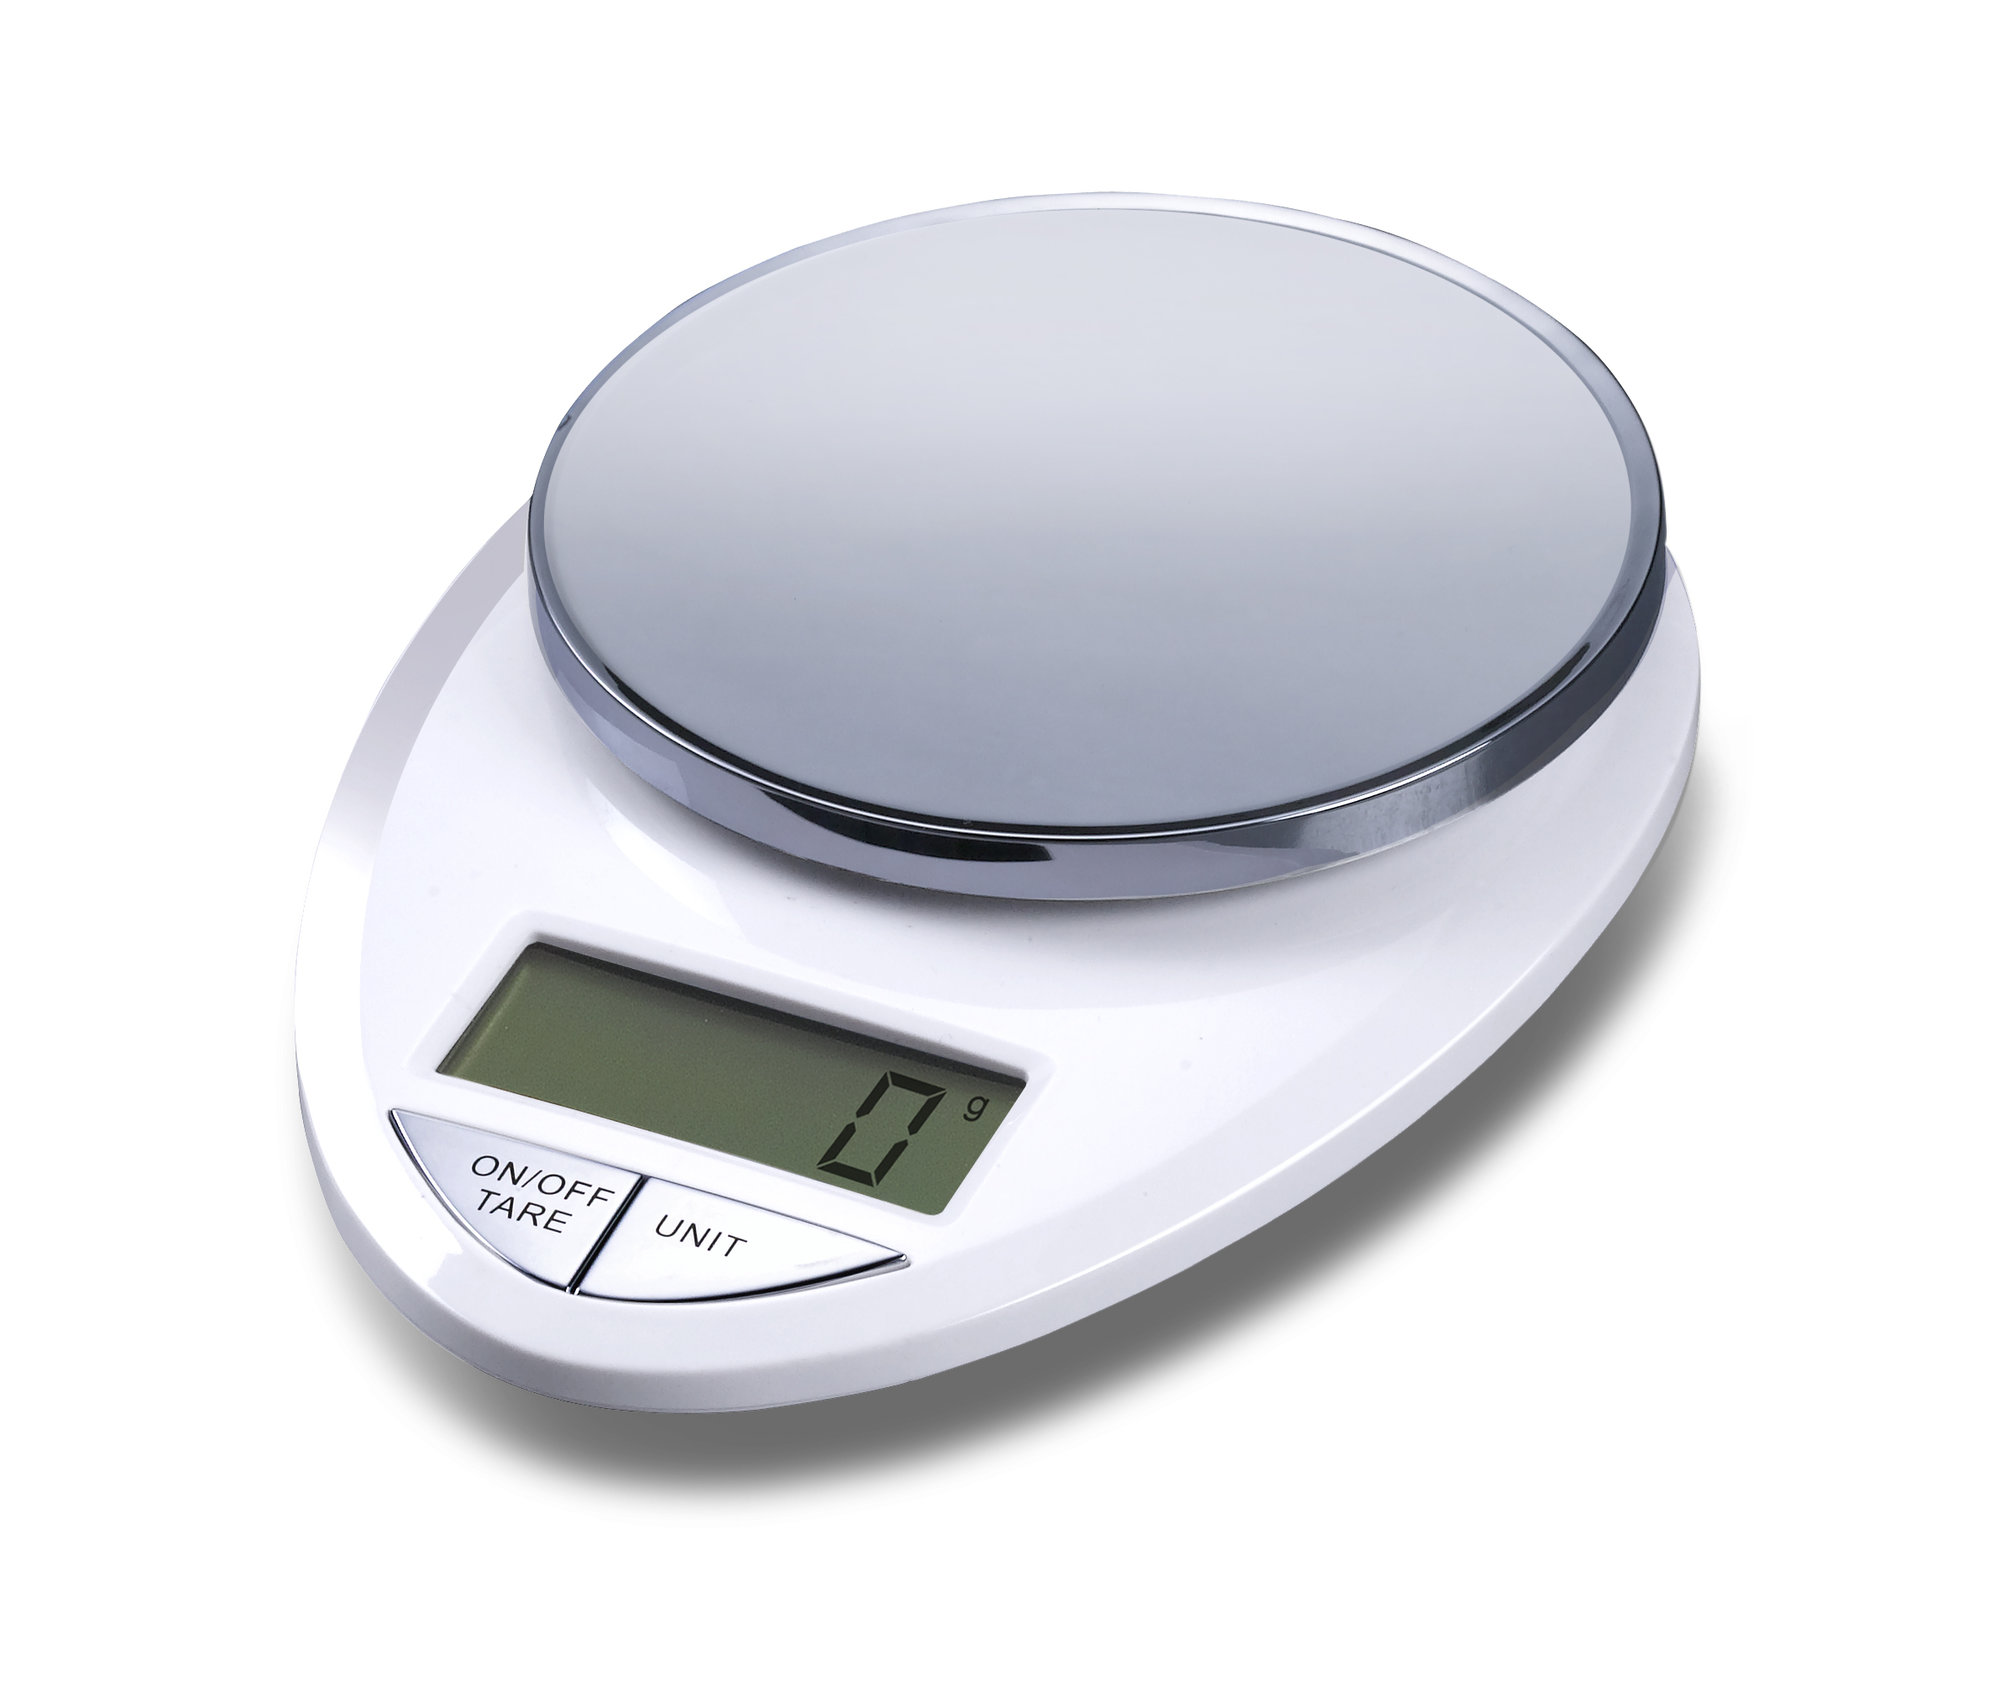 EatSmart Precision Pro Digital Kitchen Scale in White / Chrome ...